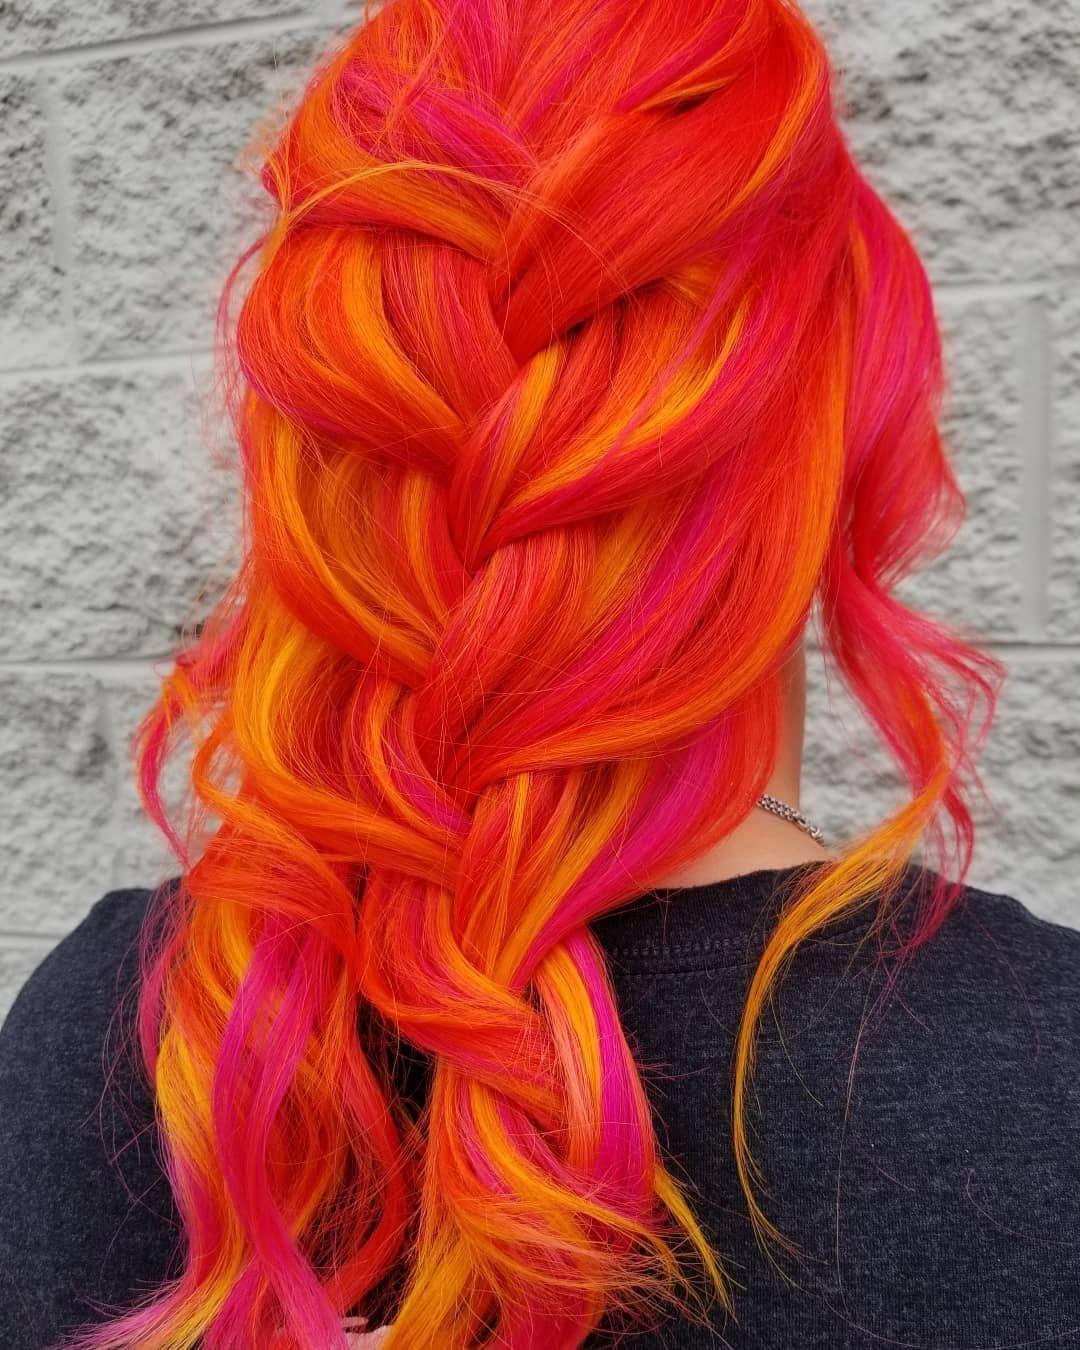 Arctic fox hair color cheyennedoeshair_ more of